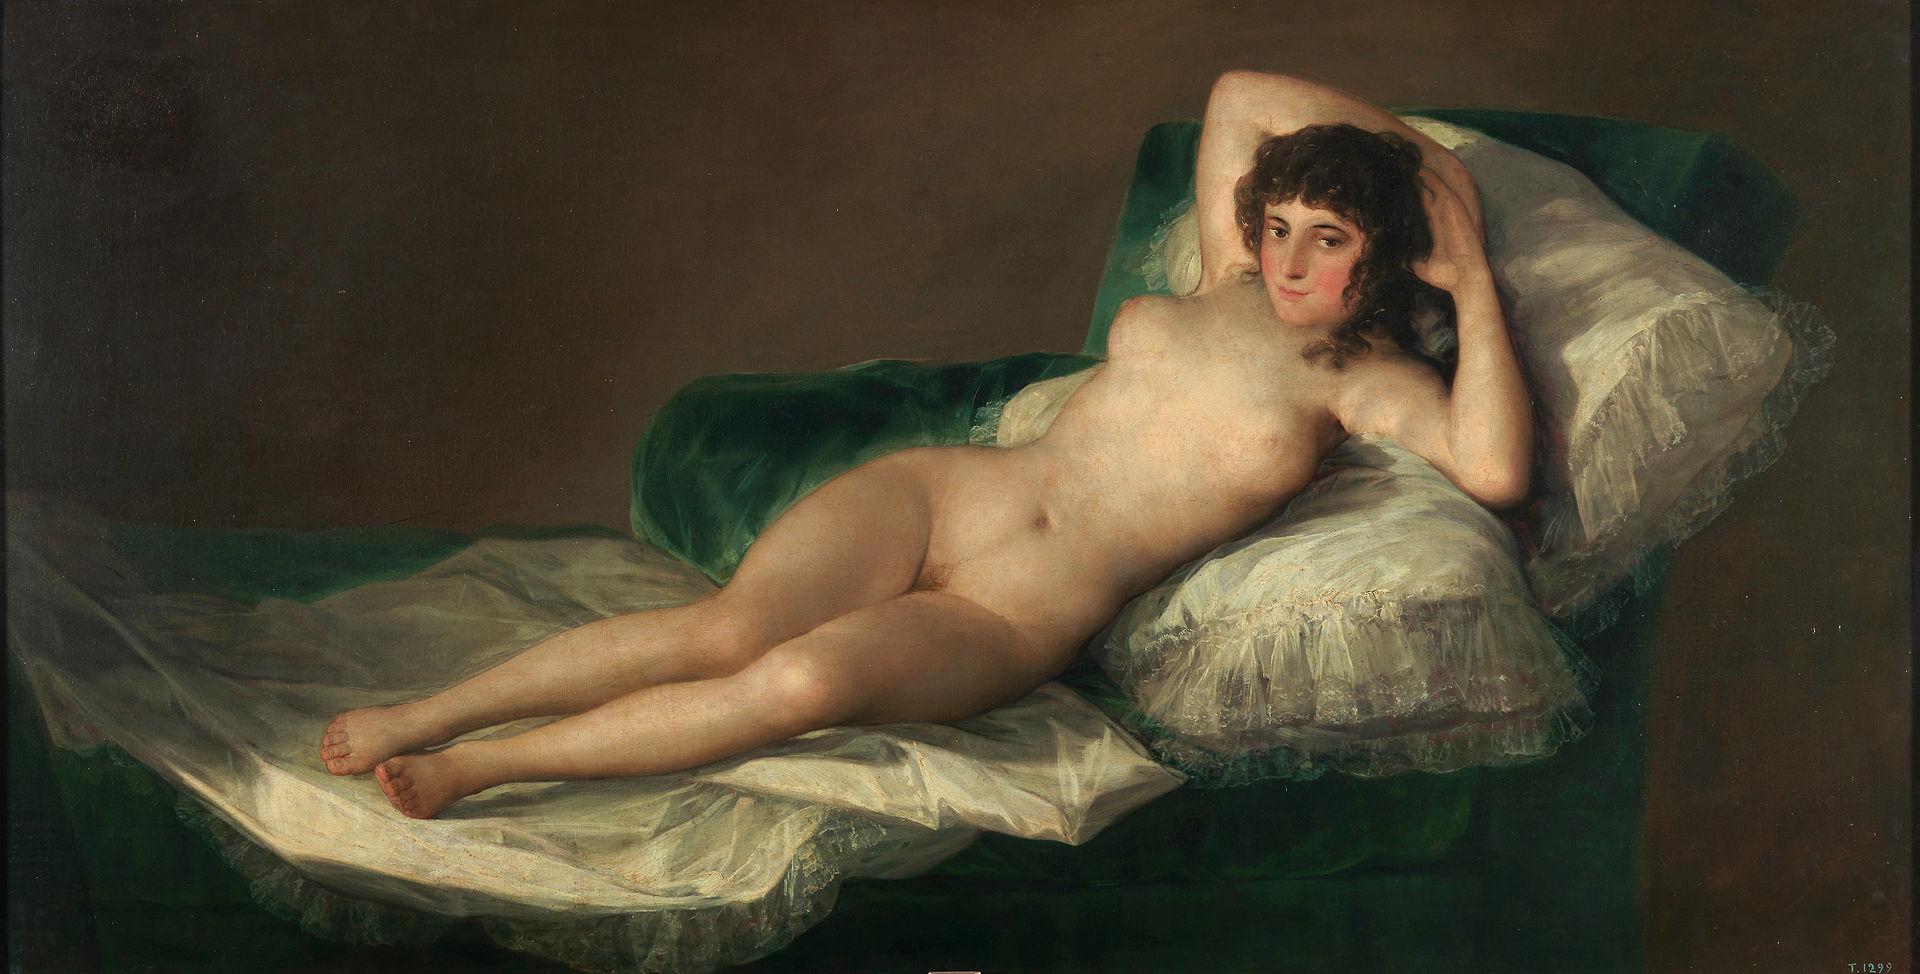 Goya - 1797-1800 La maja desnuda